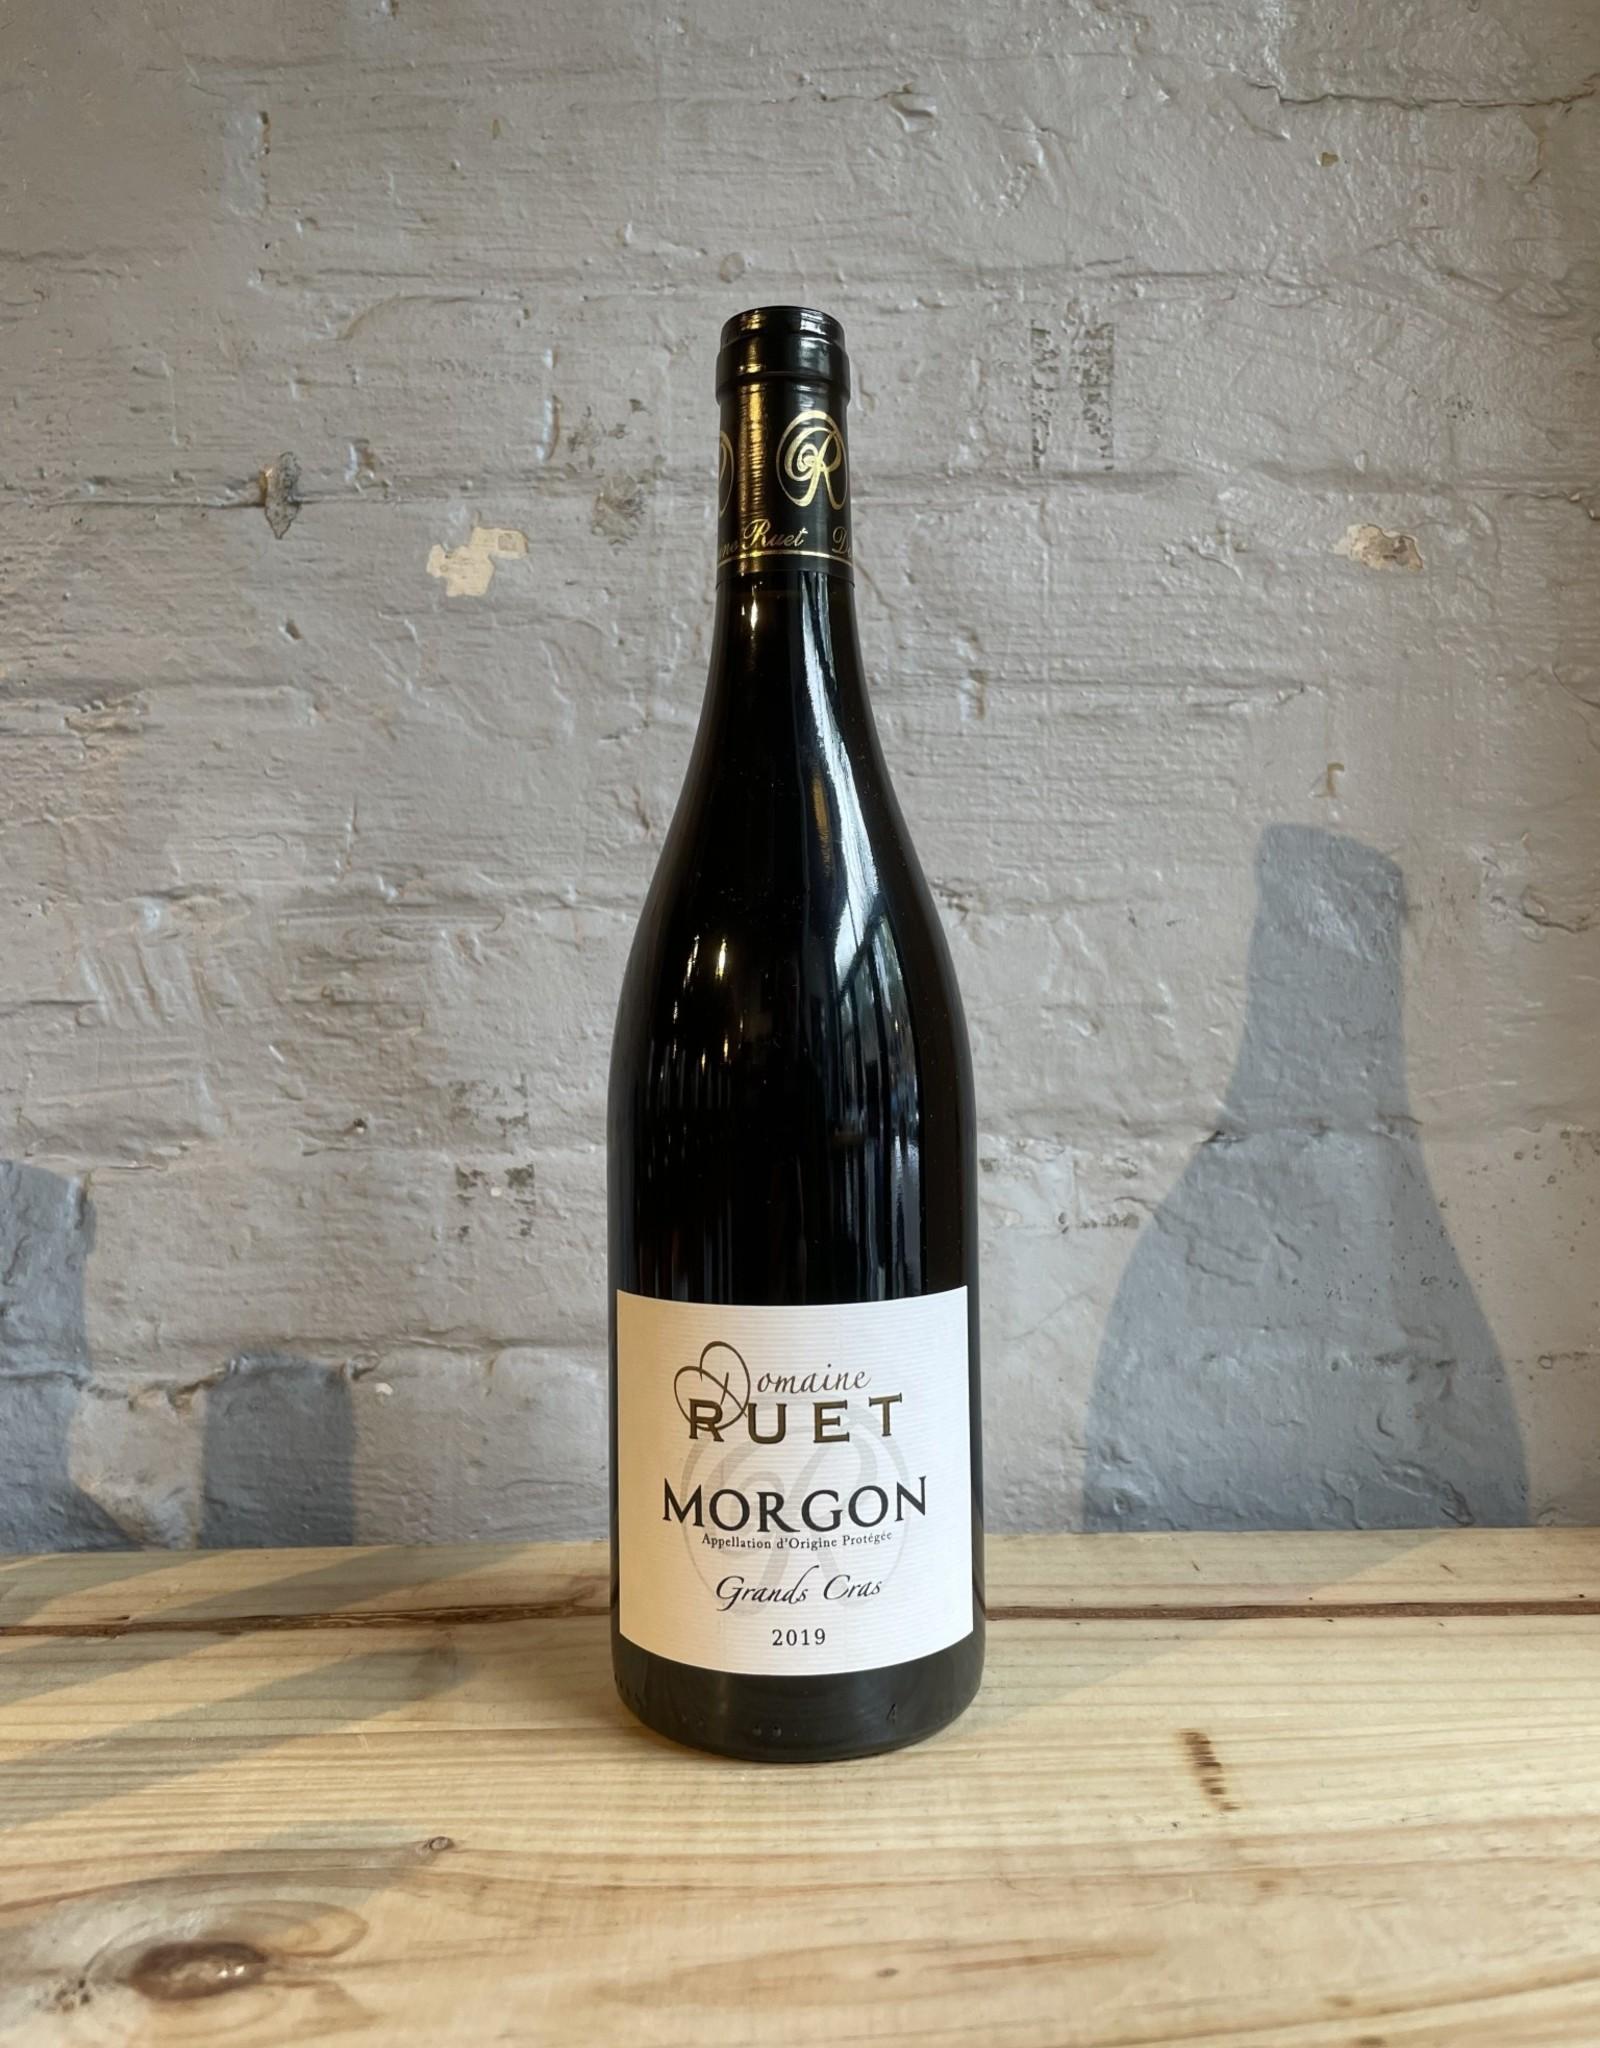 Wine 2019 Domaine Ruet Morgon Les Grands Cras - Beaujolais, France (750ml)